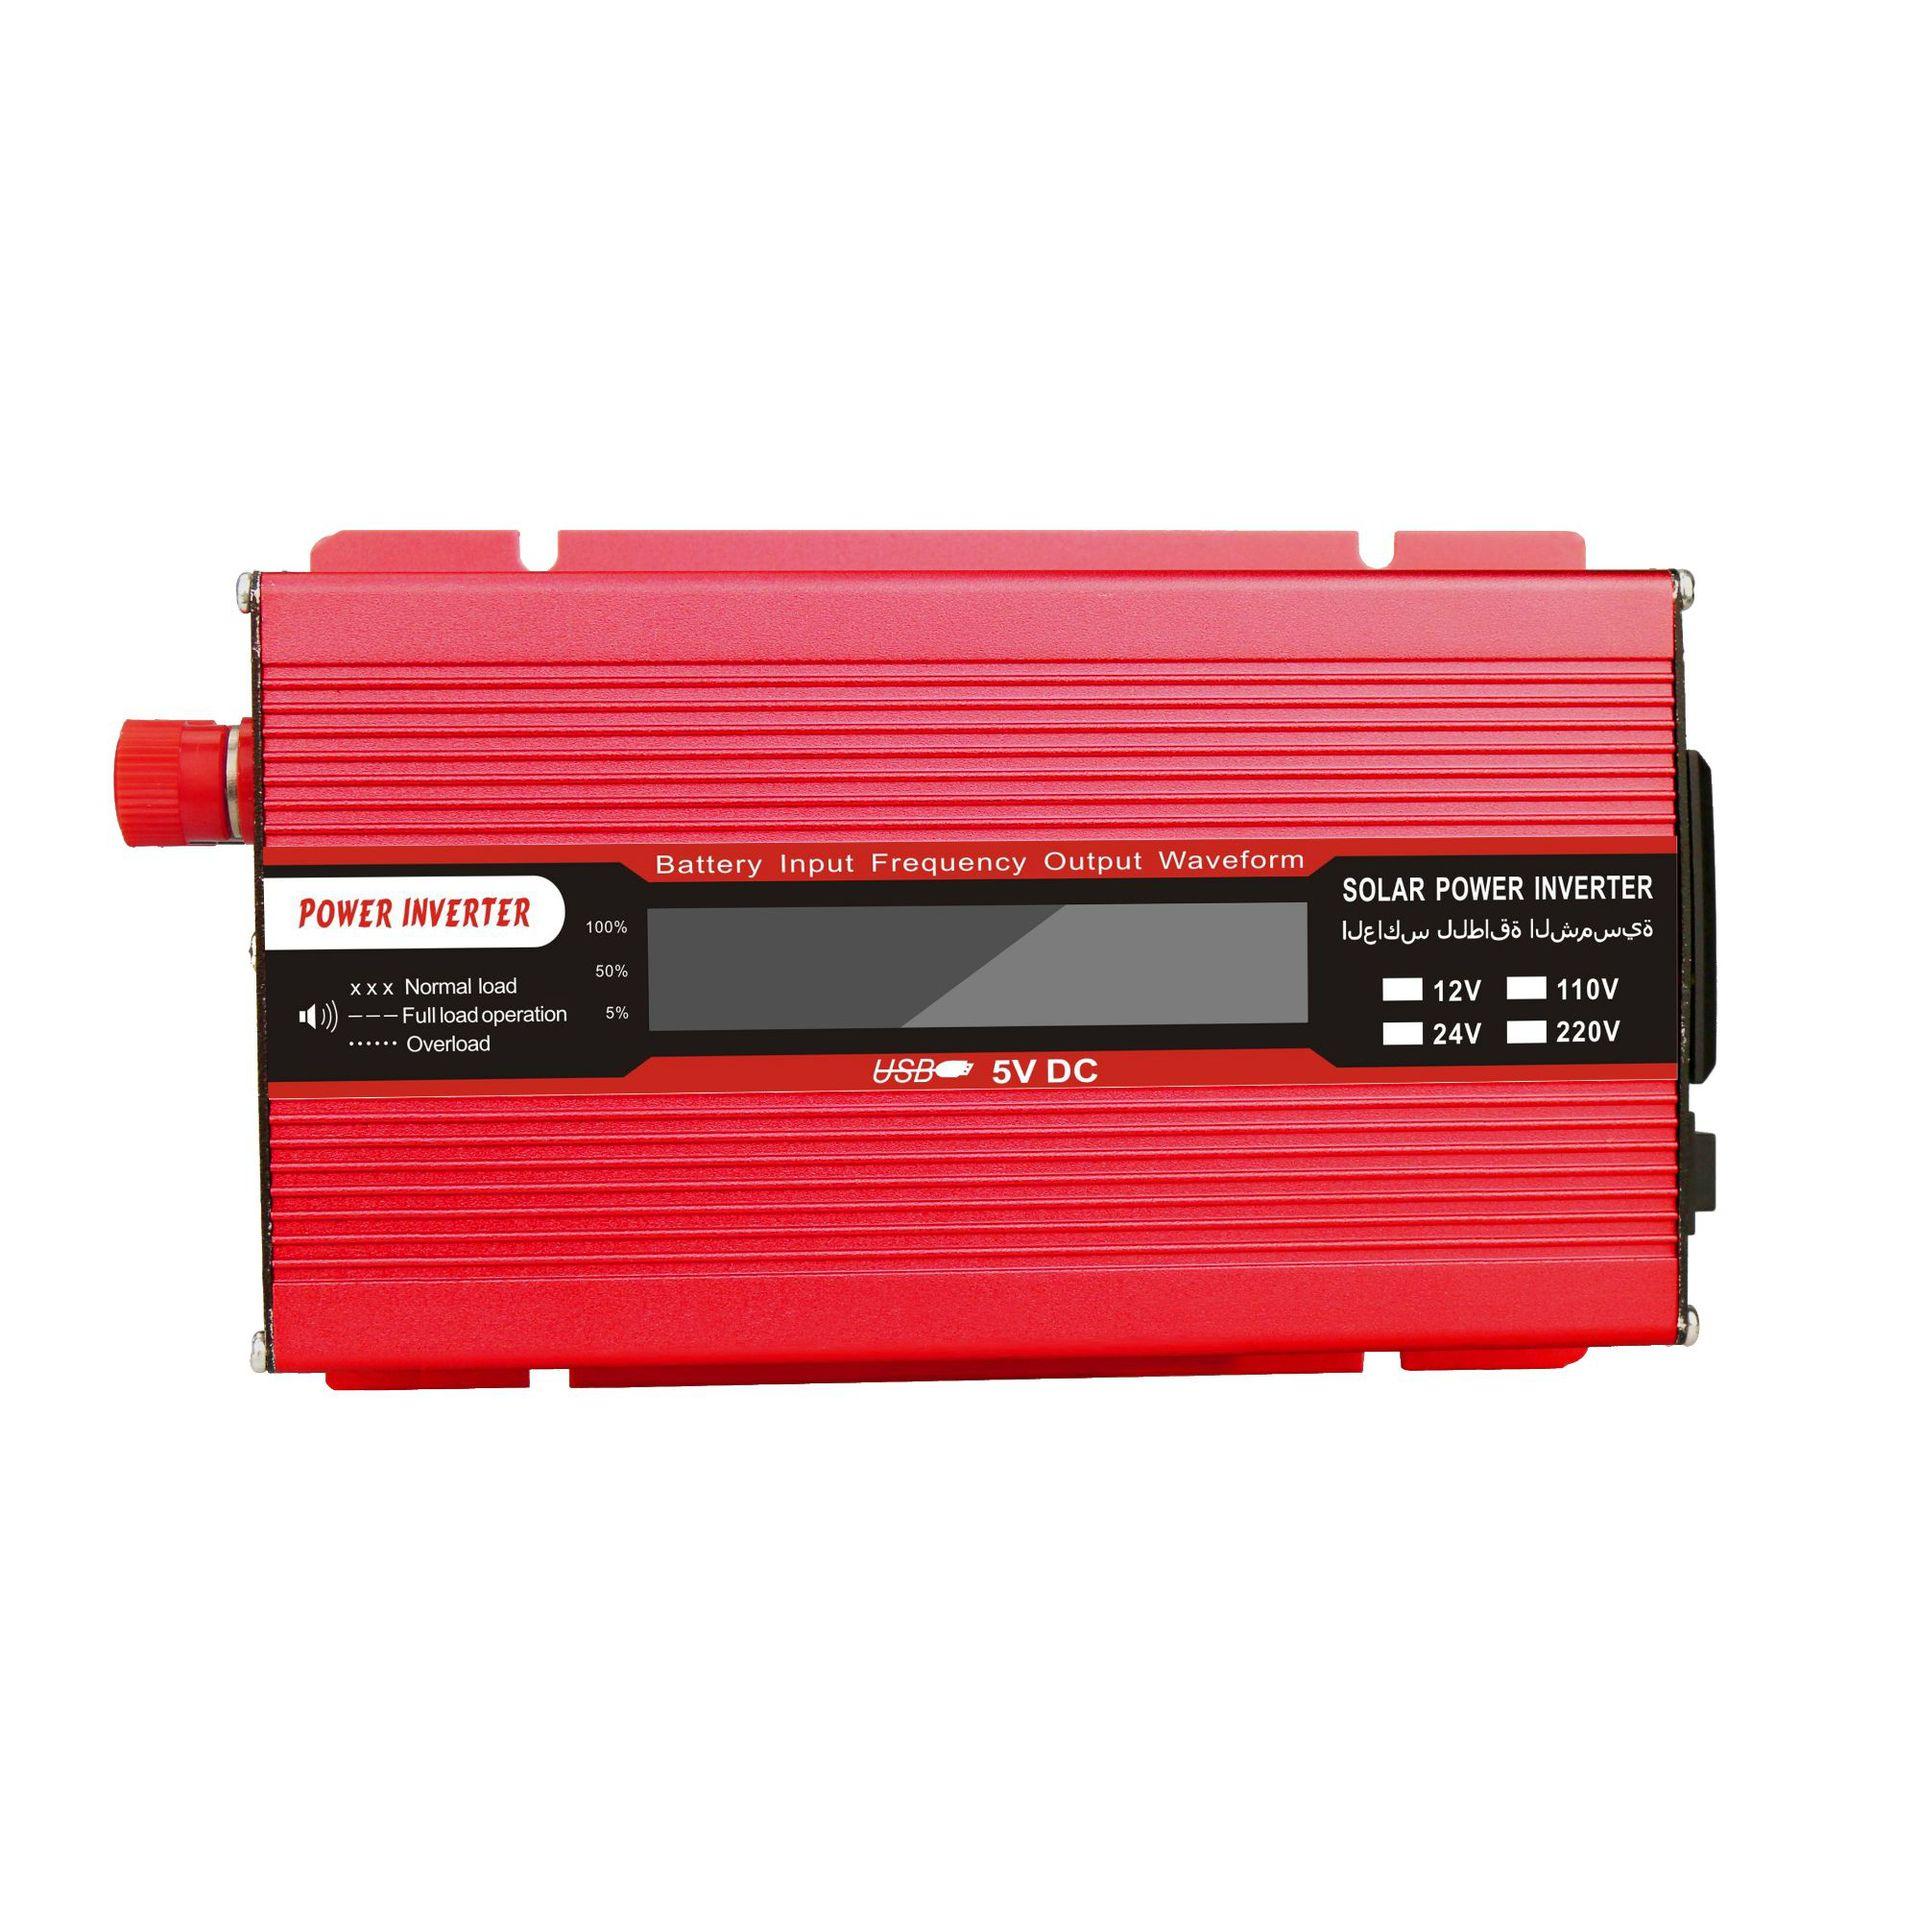 1500w Solar Inverter Multifunctional Travel Power Supply Control USB Car inverter DC 12V AC 220V LCD